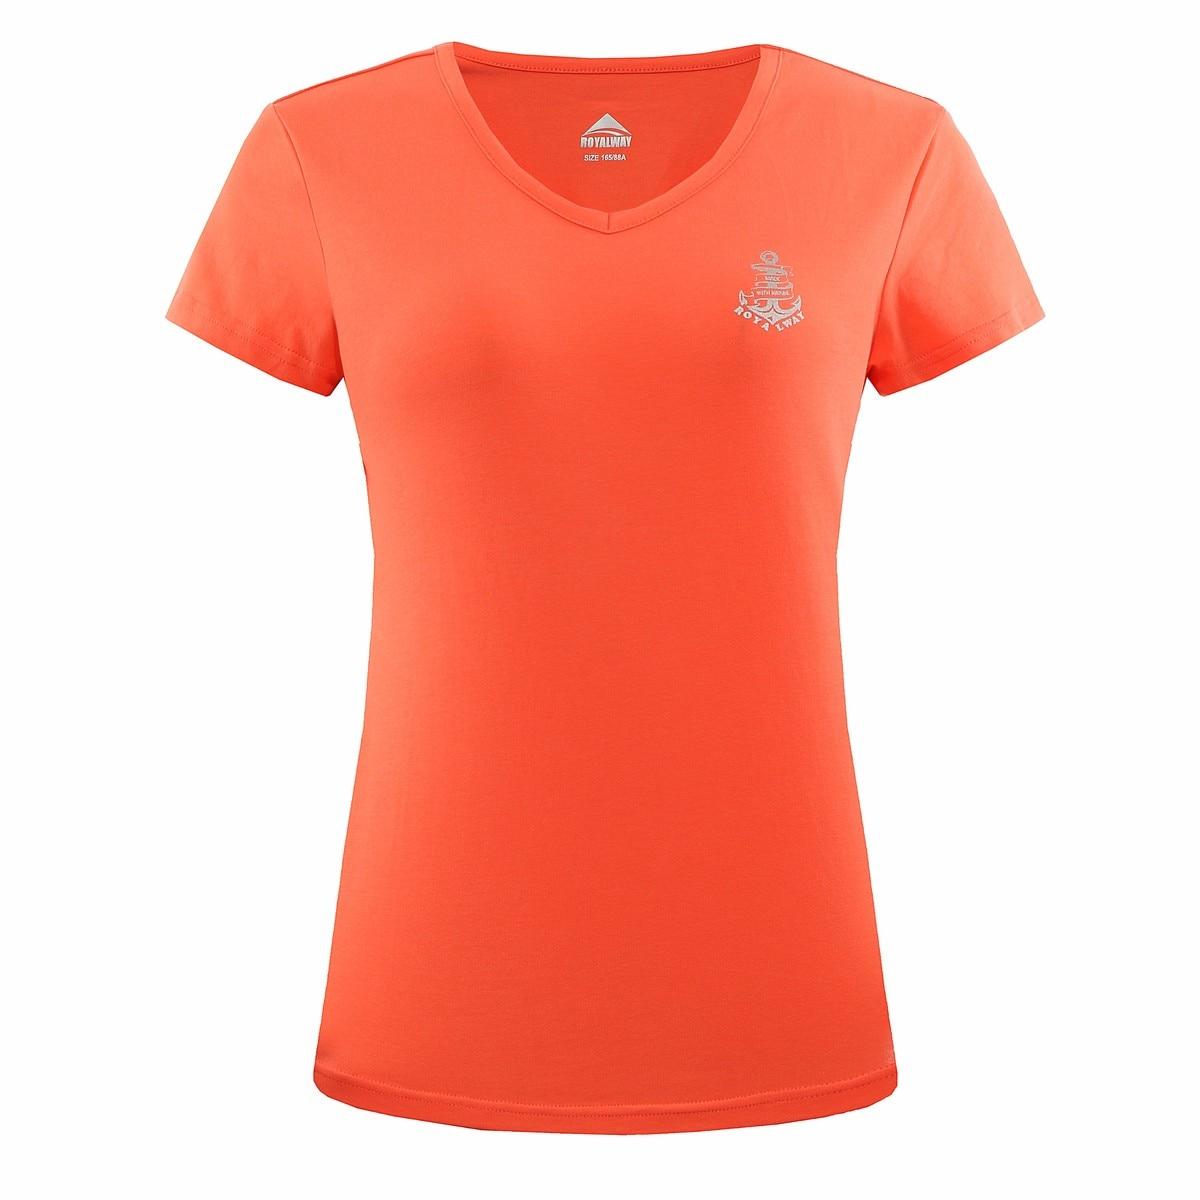 Hunting Shirt#RFTL2022Glianmeng T-shirts Outdoor